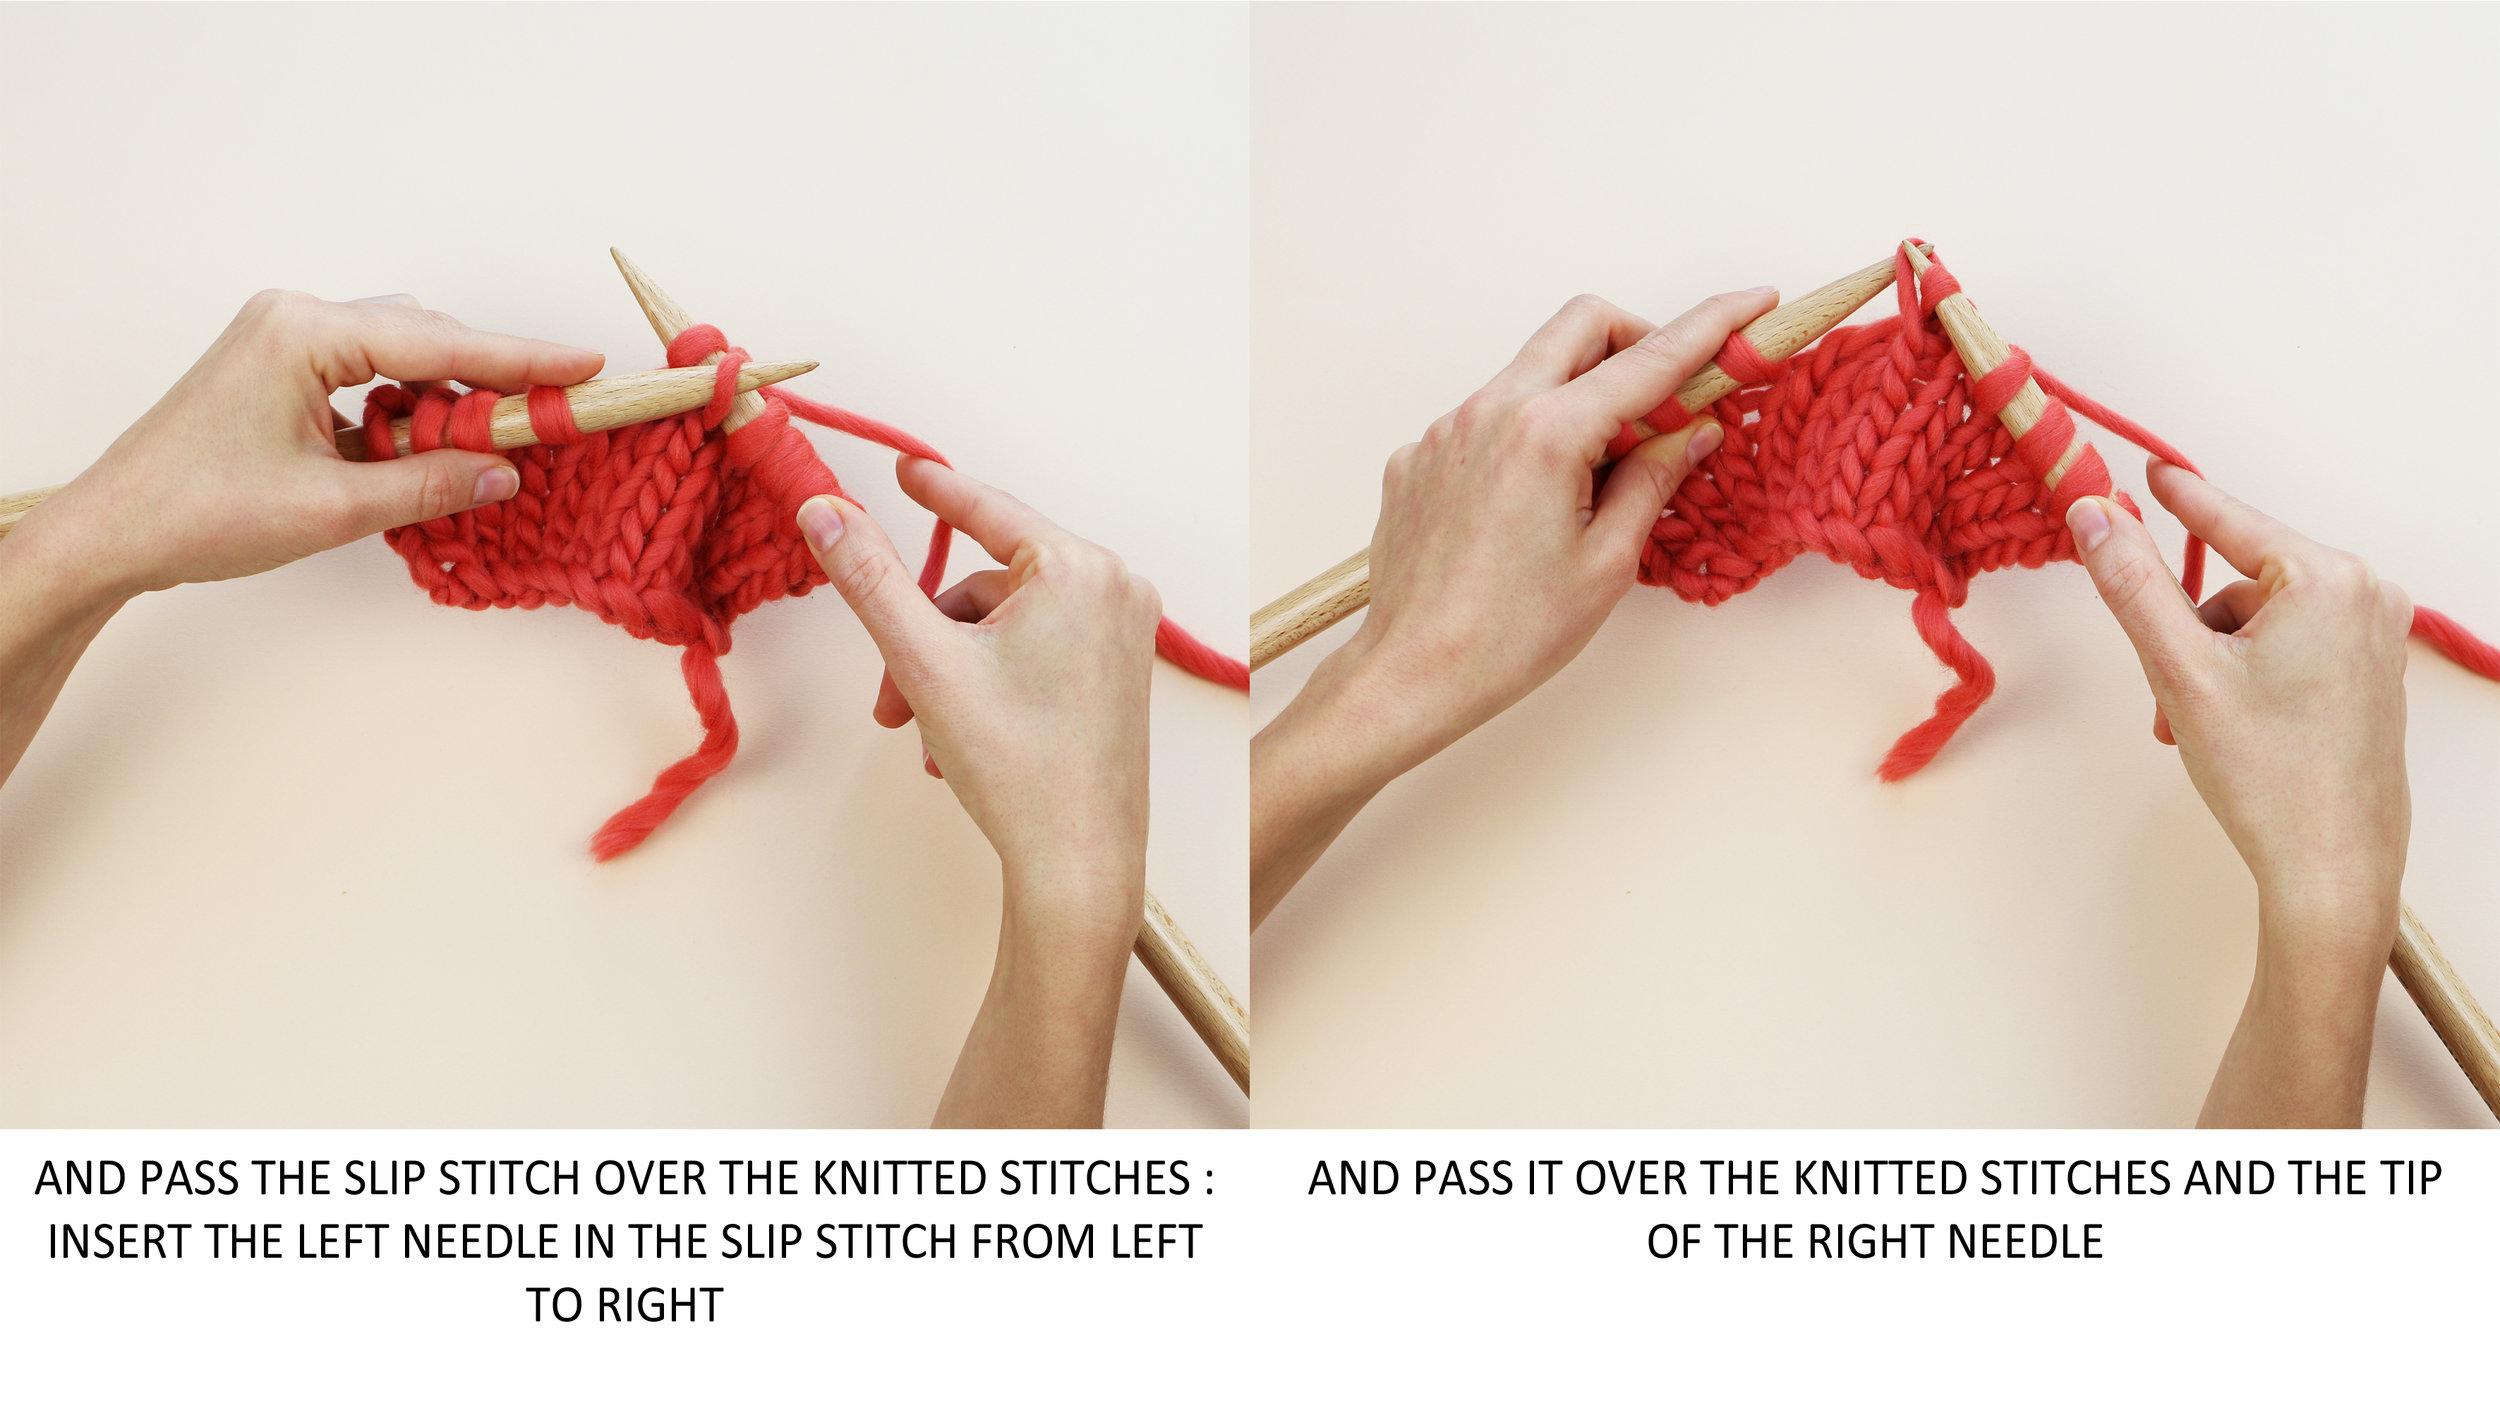 Slip 1 Knit 2 together Pass slip stitch over_3.jpg